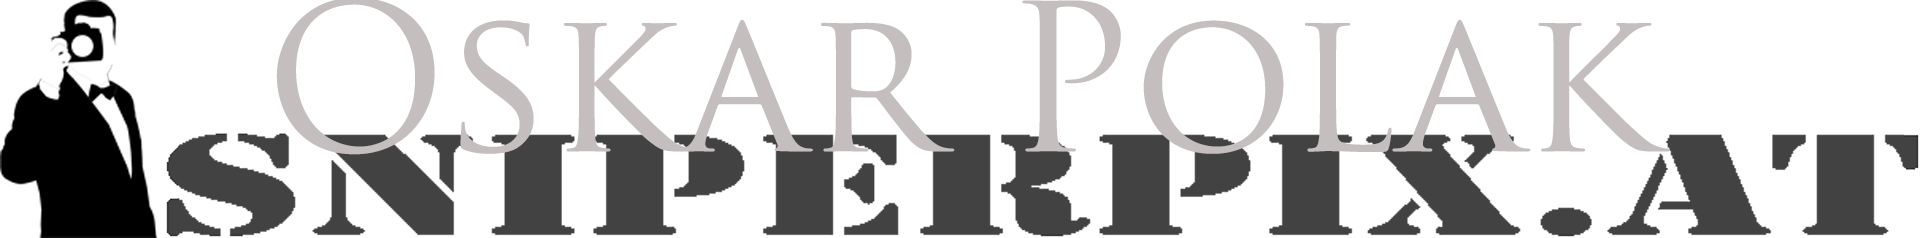 Sniperpix Logo